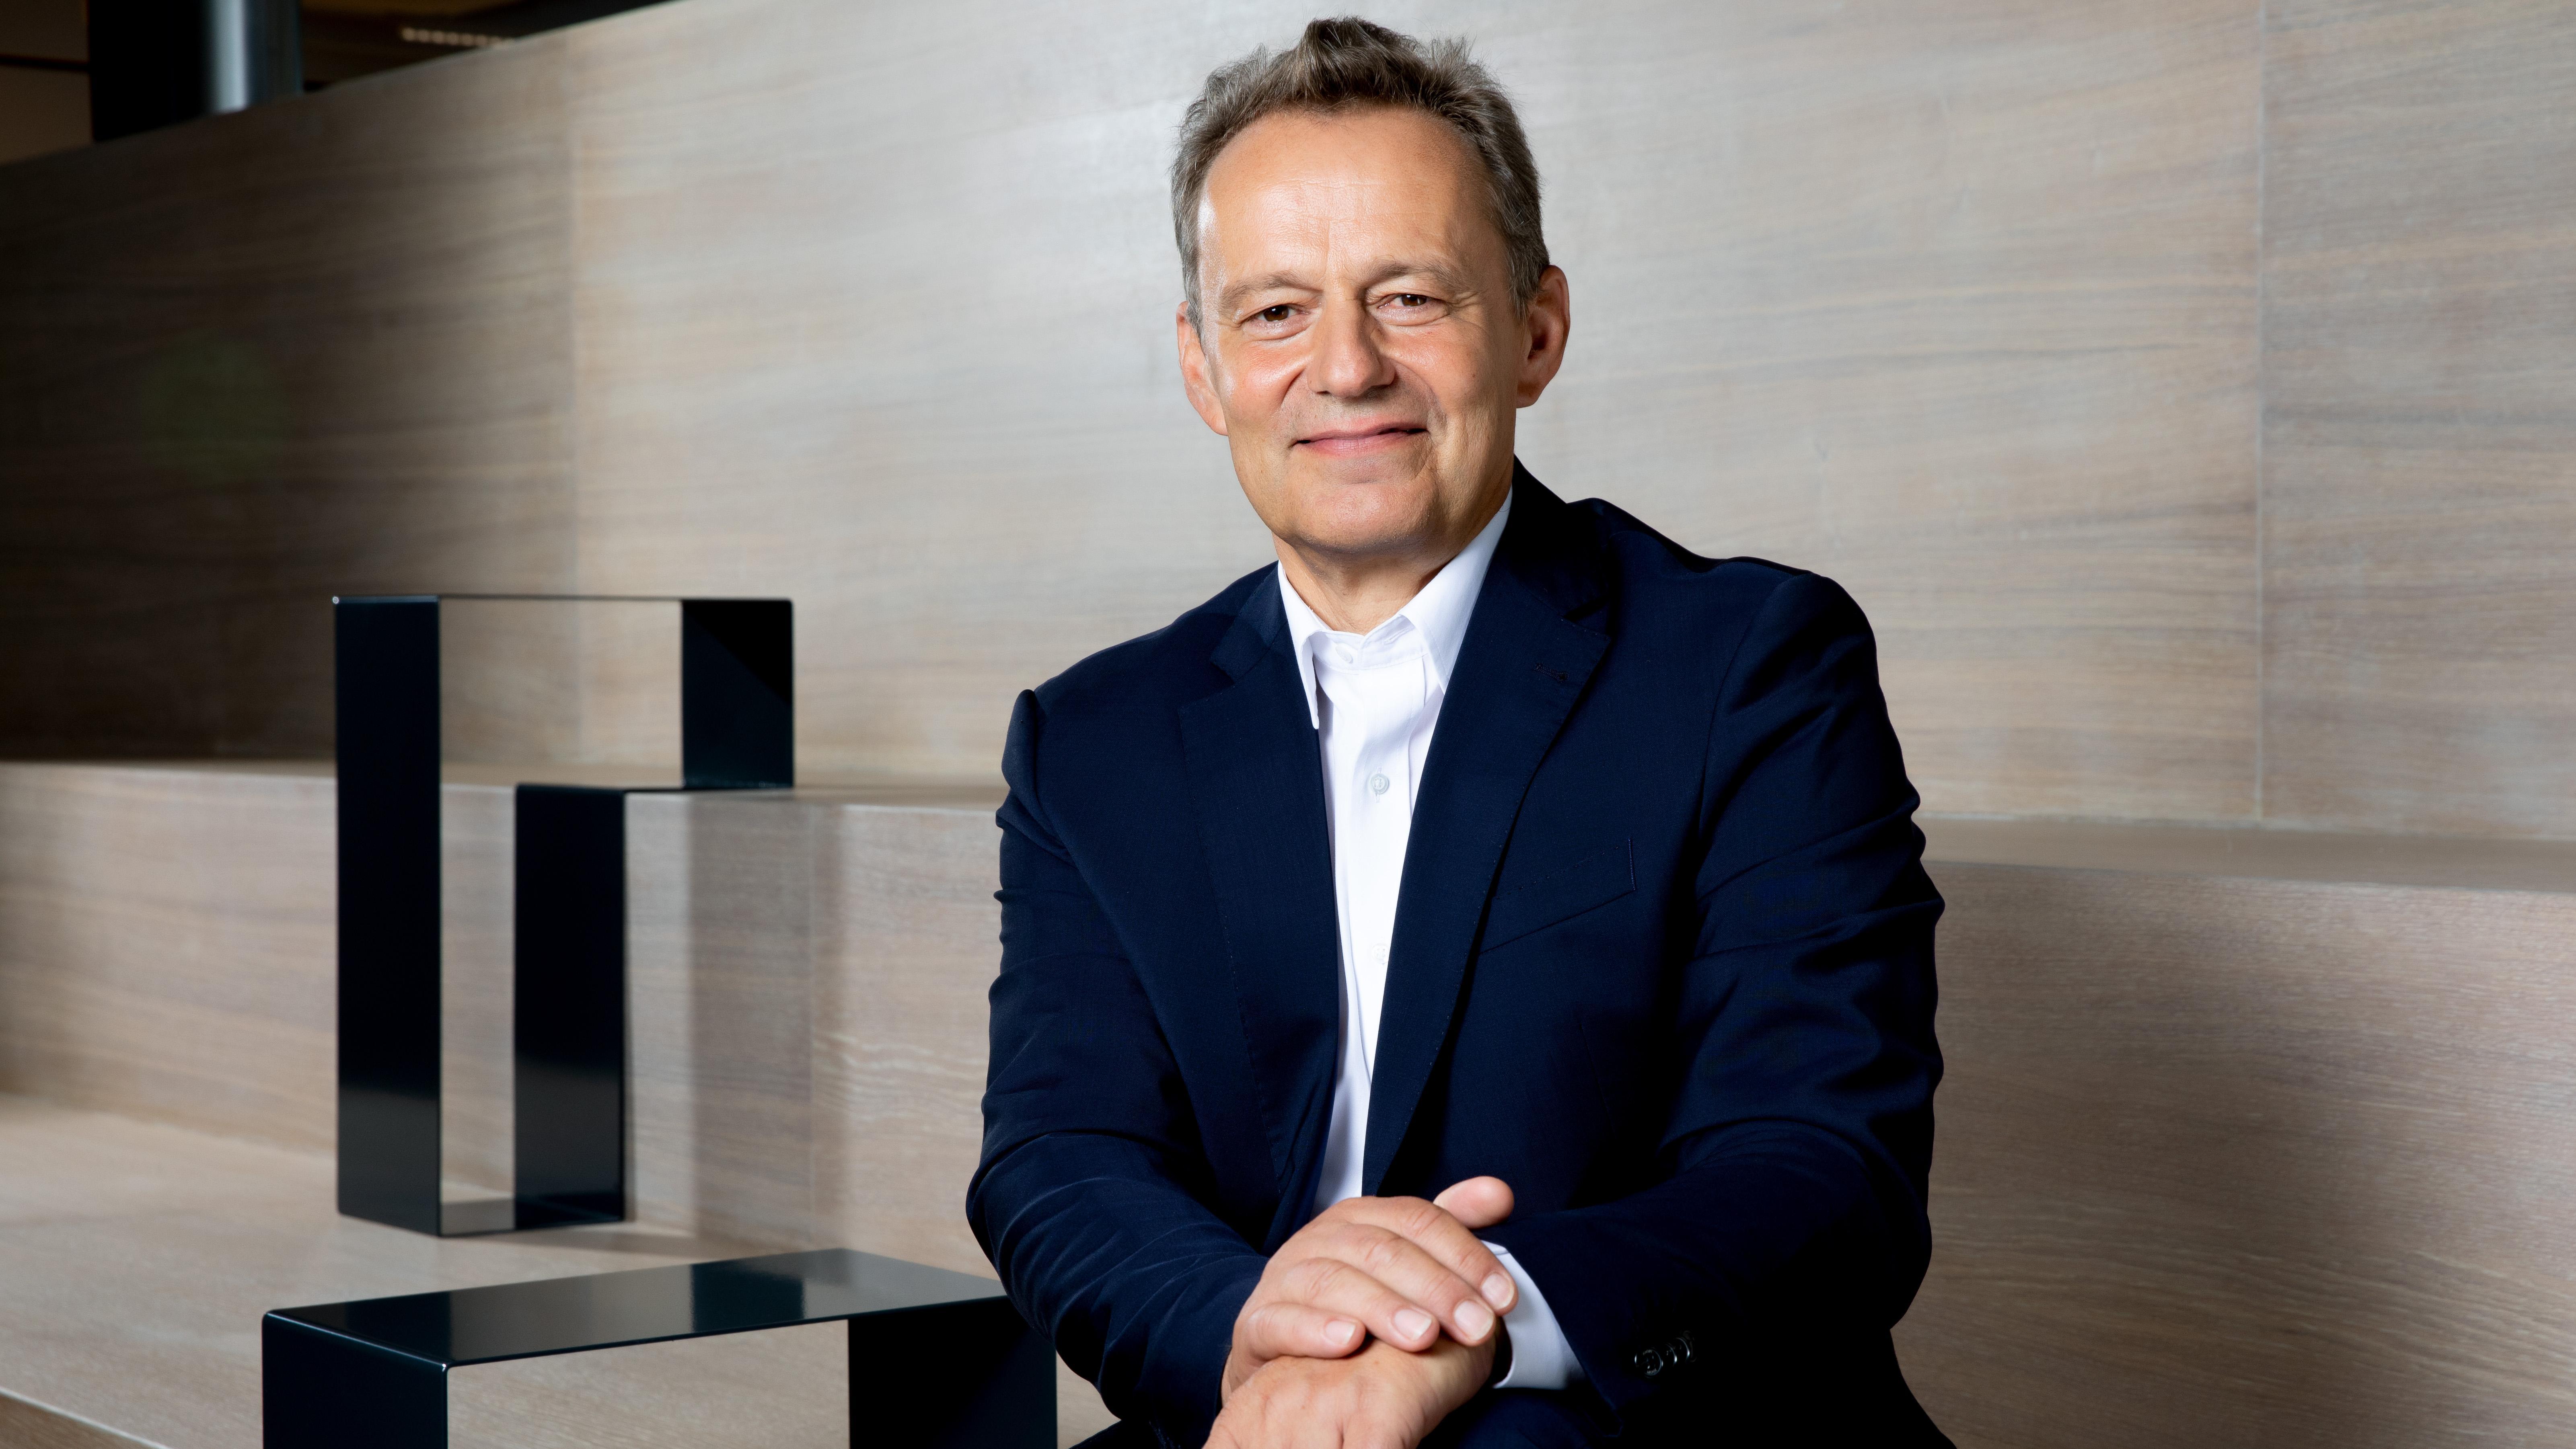 Hermann Ditz, Member of the Board of Management